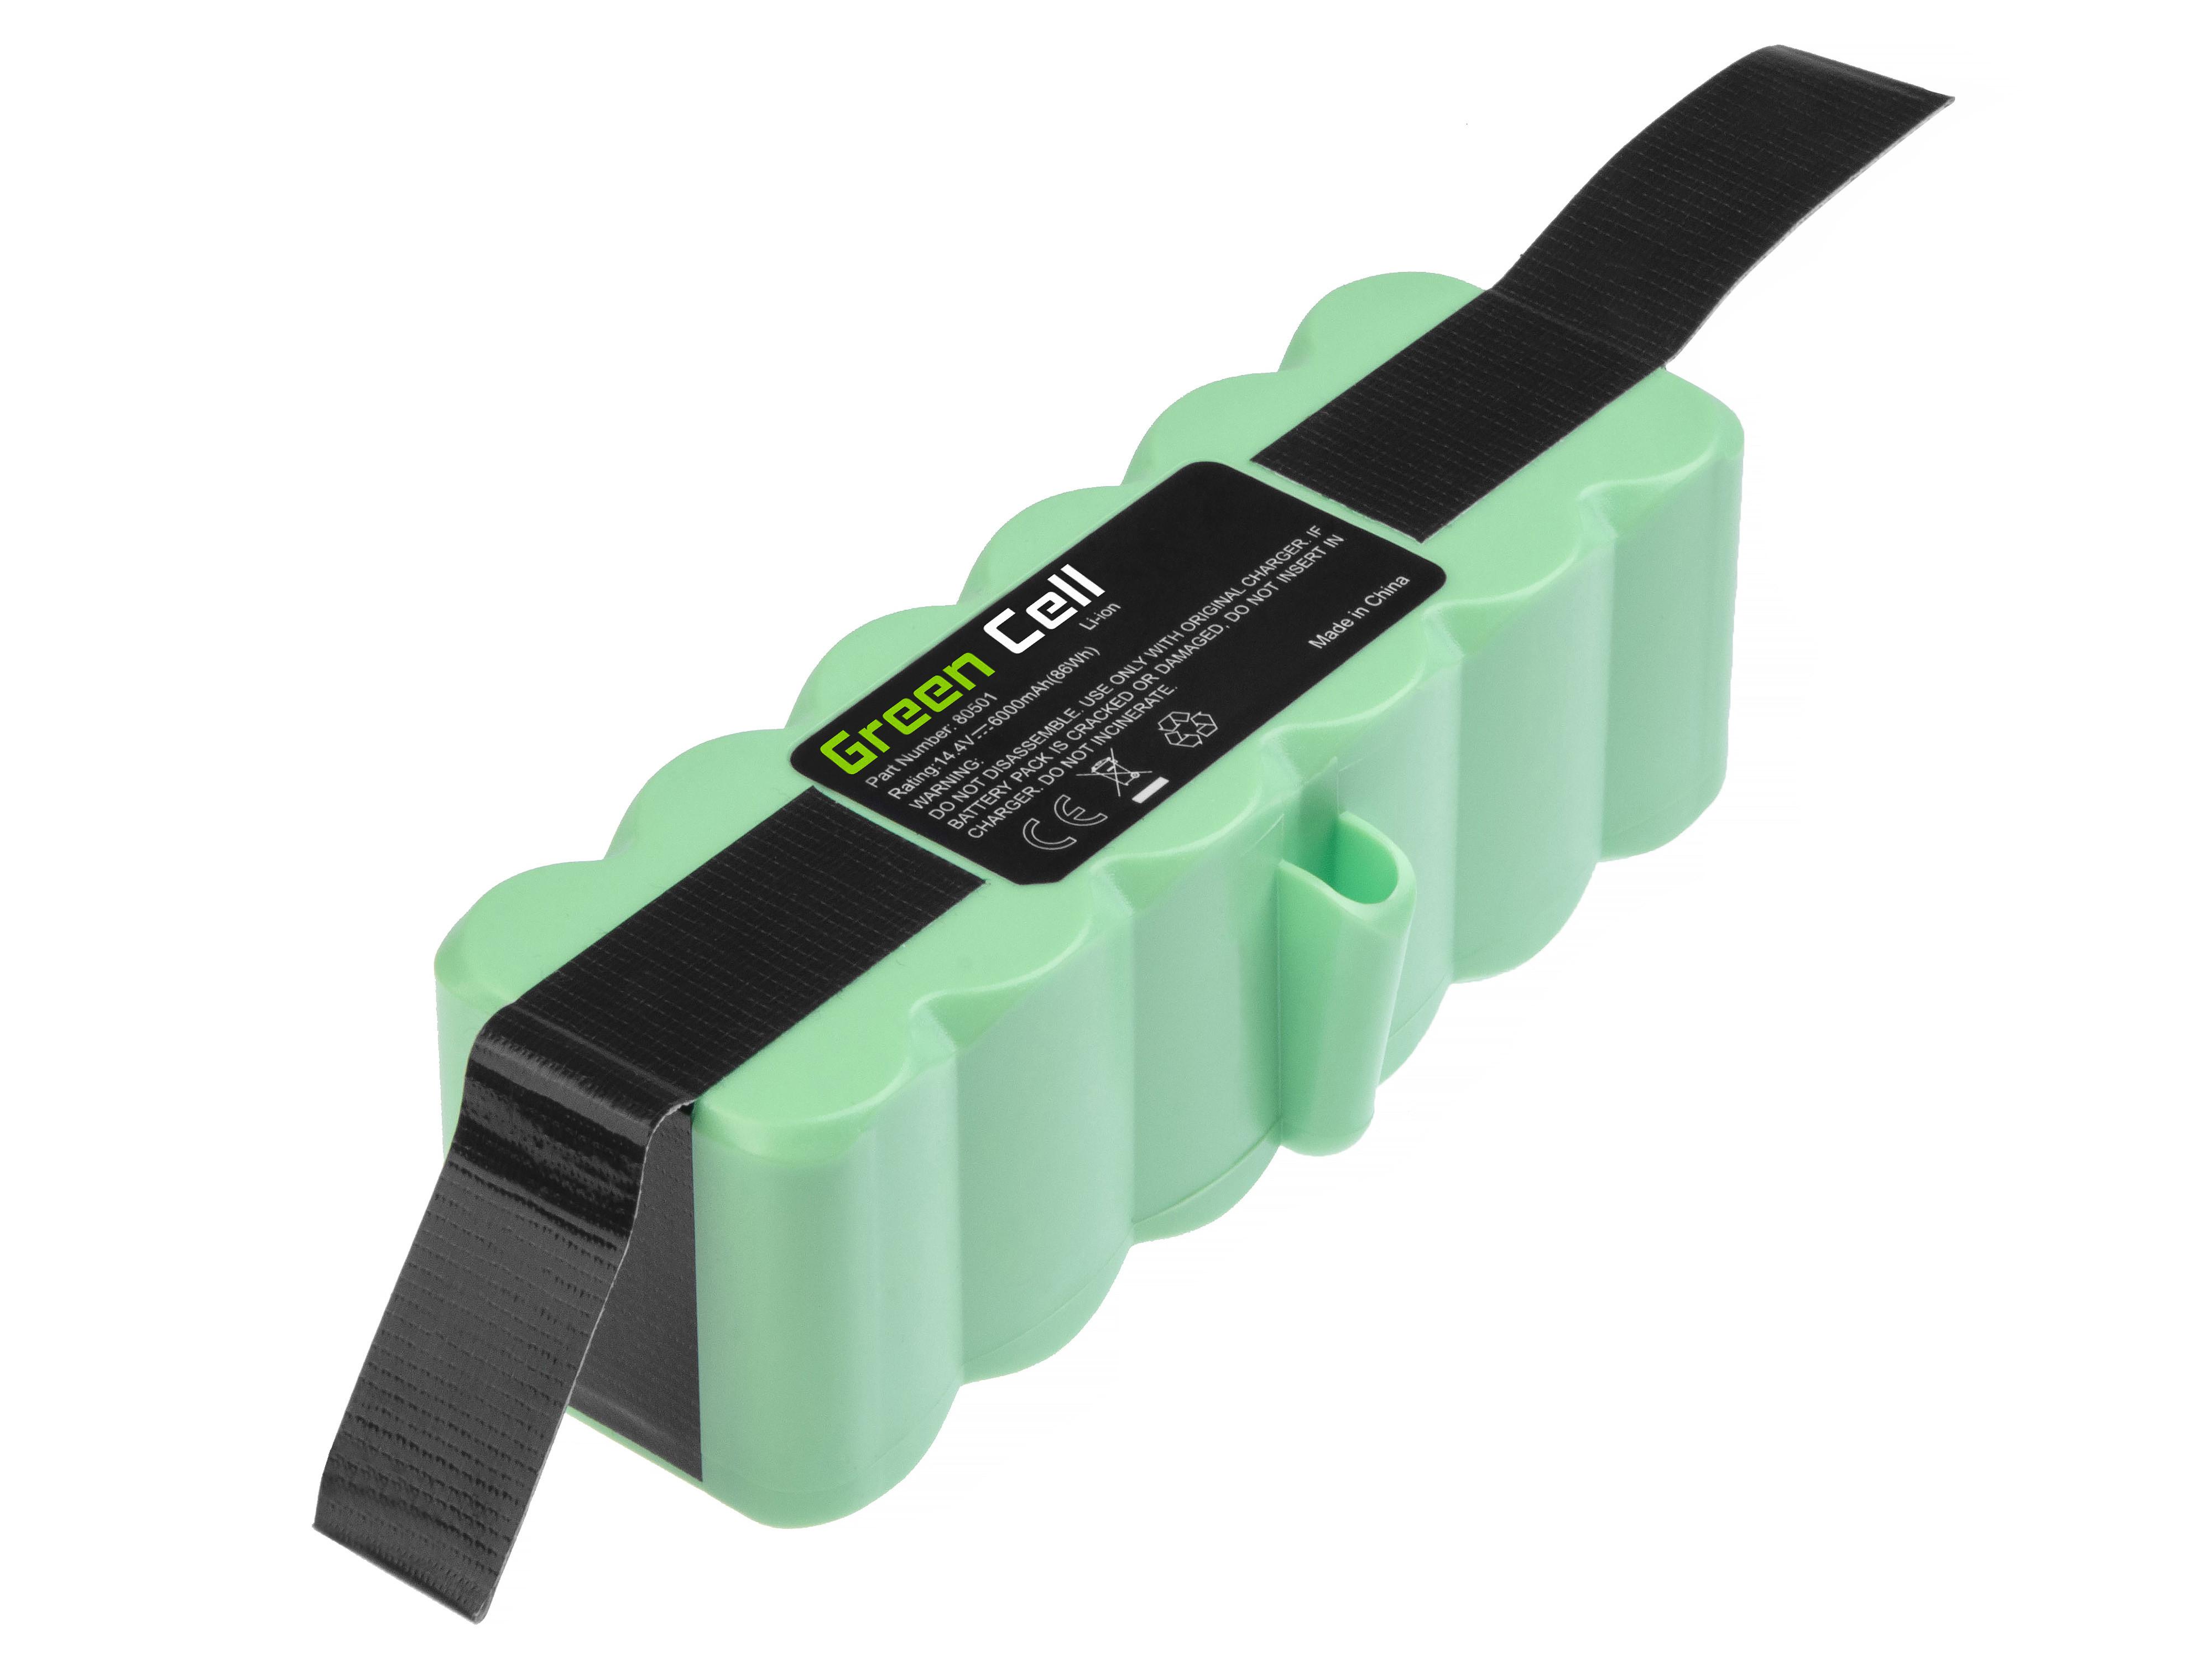 Baterie Green Cell iRobot Roomba 500 630 14.4V 14.4V 6000mAh Li-ion - neoriginální